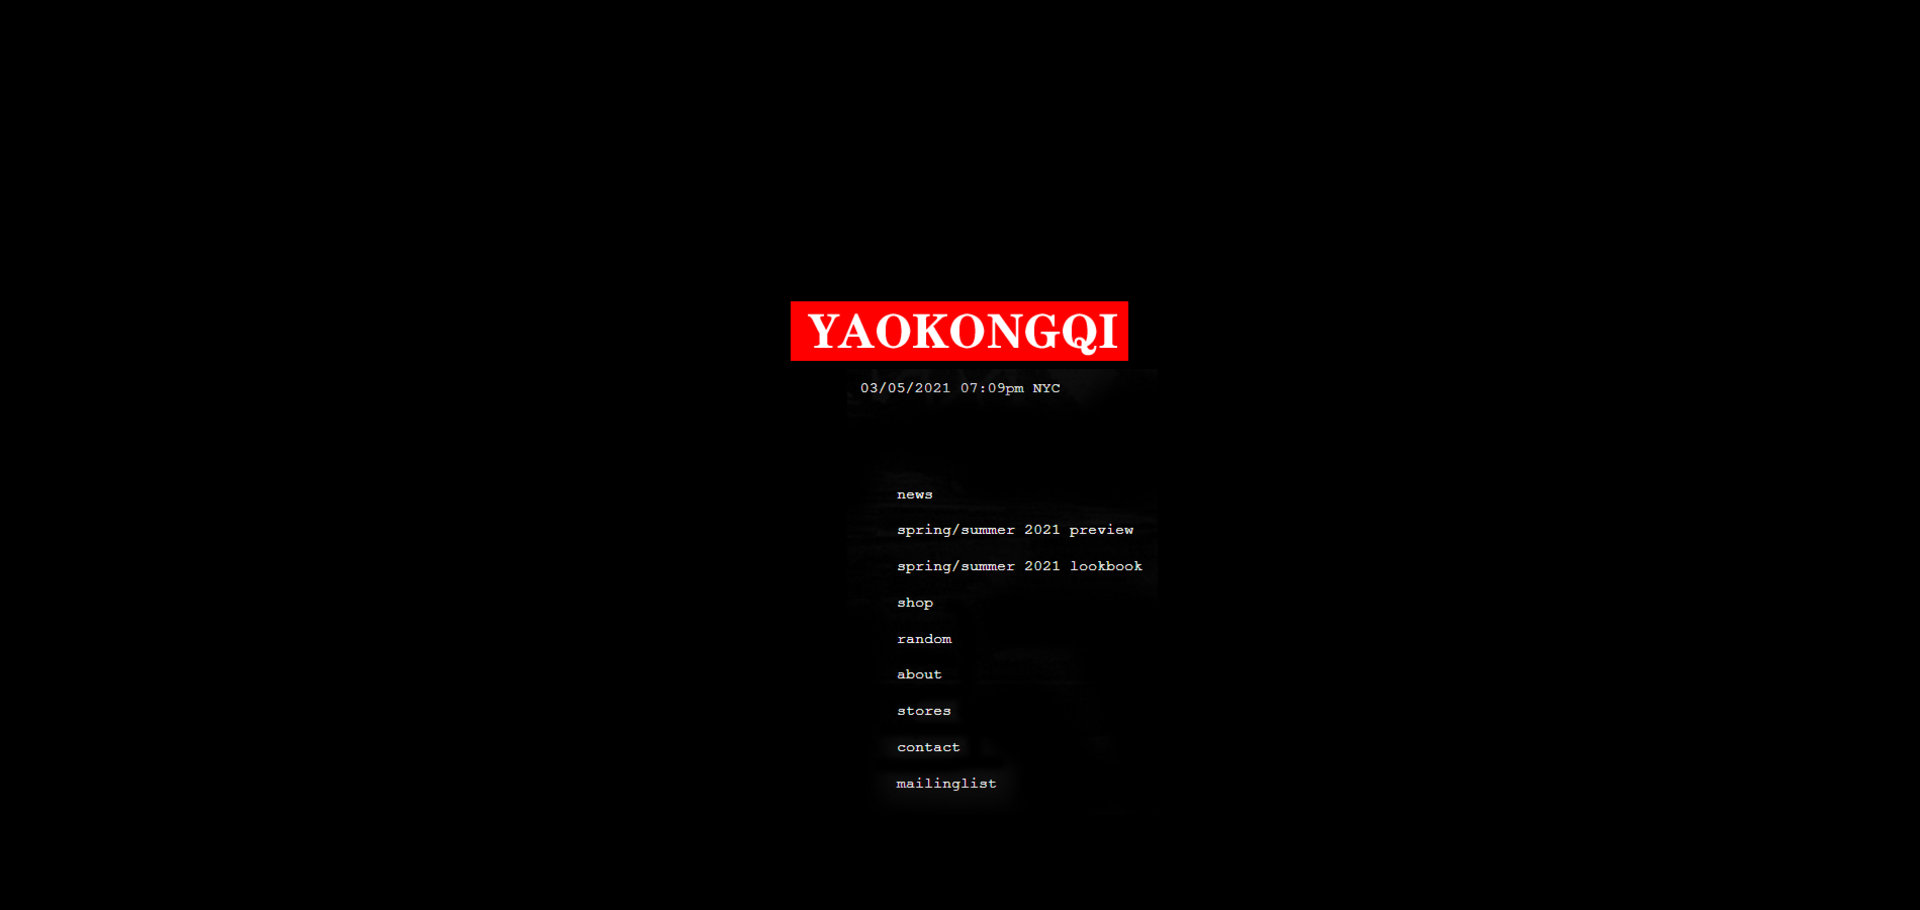 YAOKONGQI —HOMEPAGE